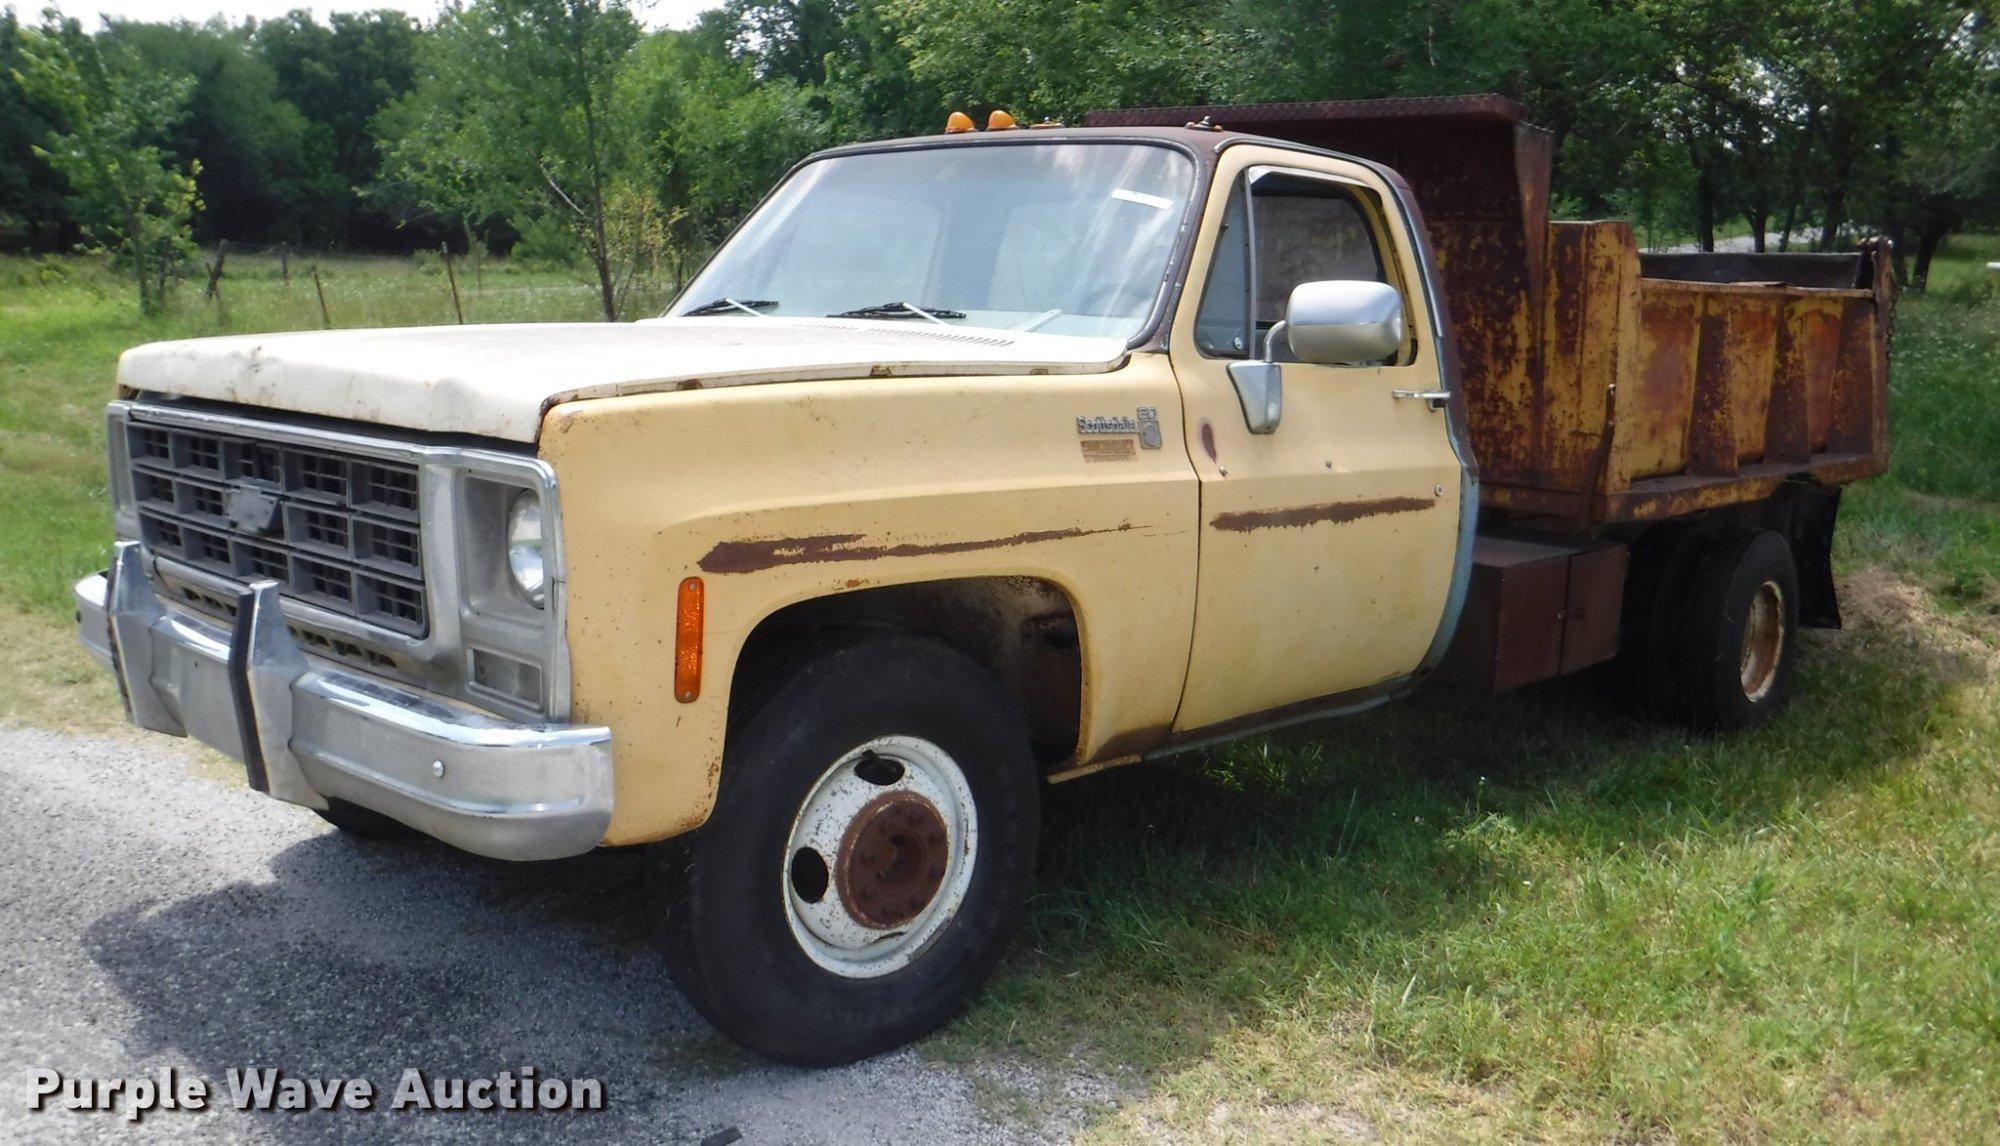 hight resolution of ca9610 image for item ca9610 1978 chevrolet scottsdale c20 dump bed pickup truck